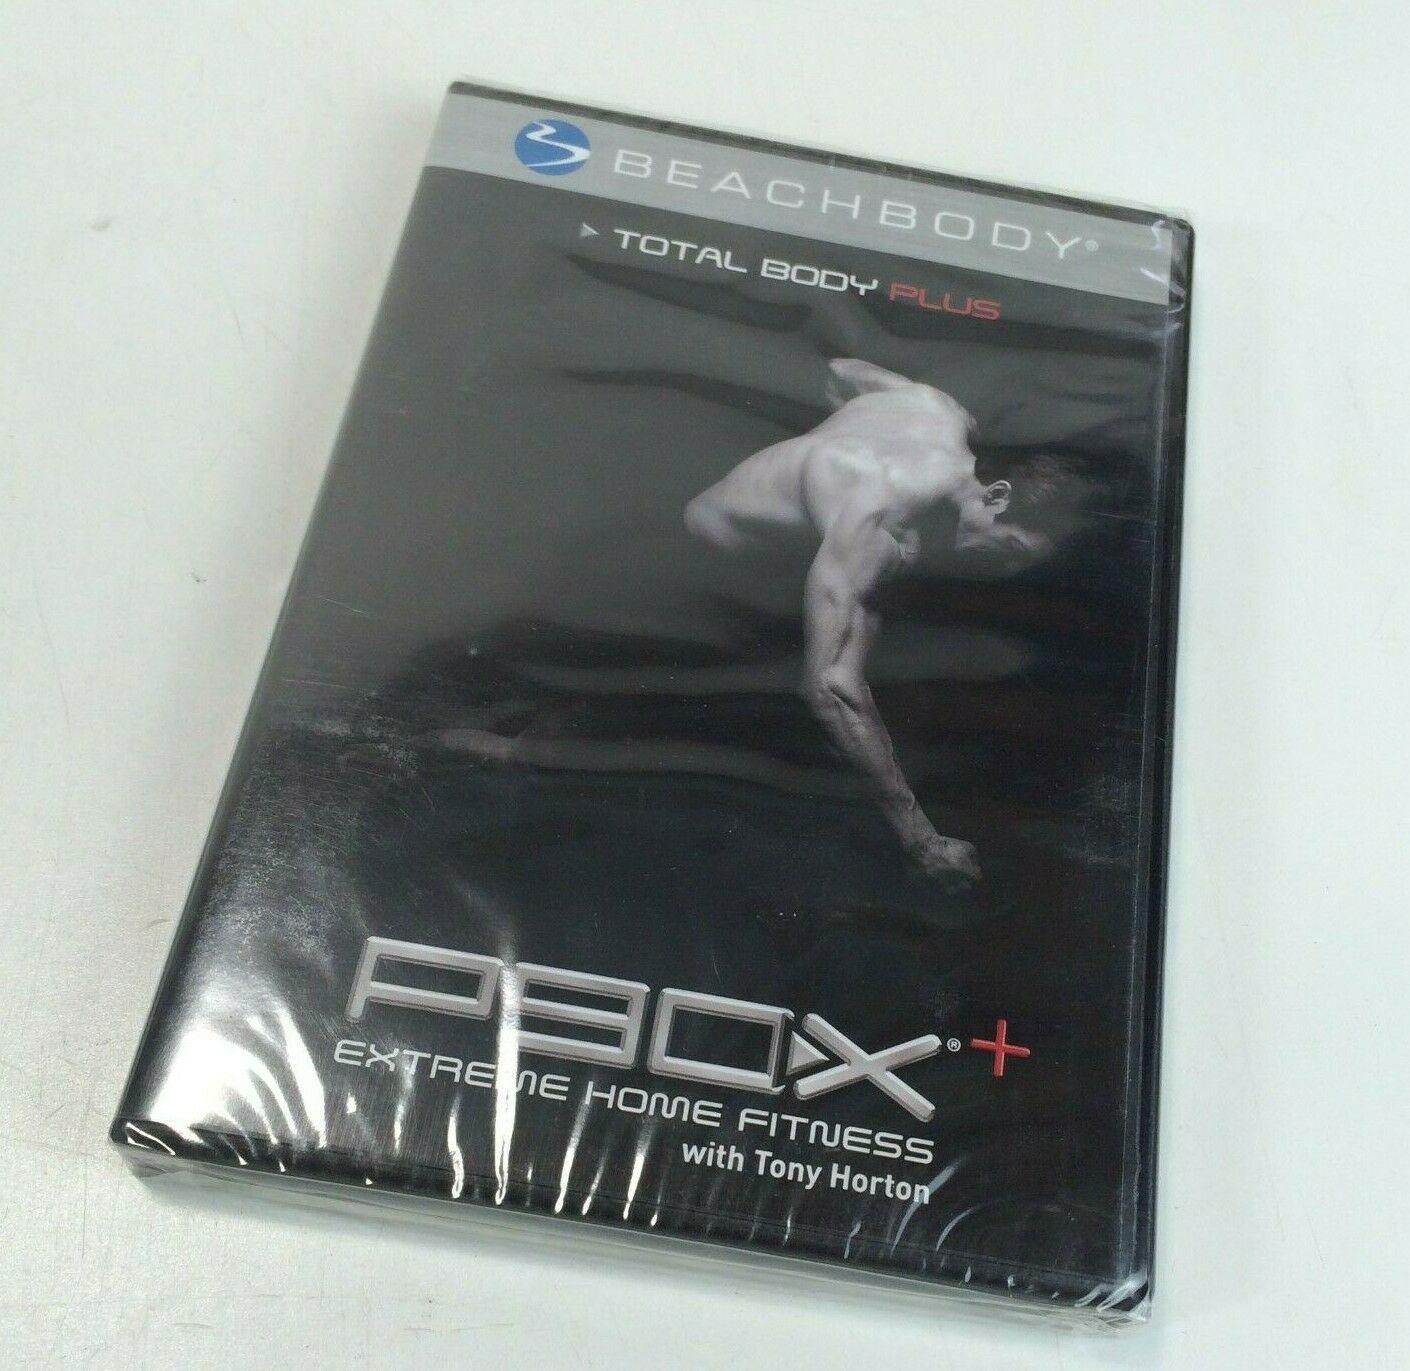 BEACHBODY P90X+ Extreme Home Fitness Total Body Plus with Tony Horton DVD NEW